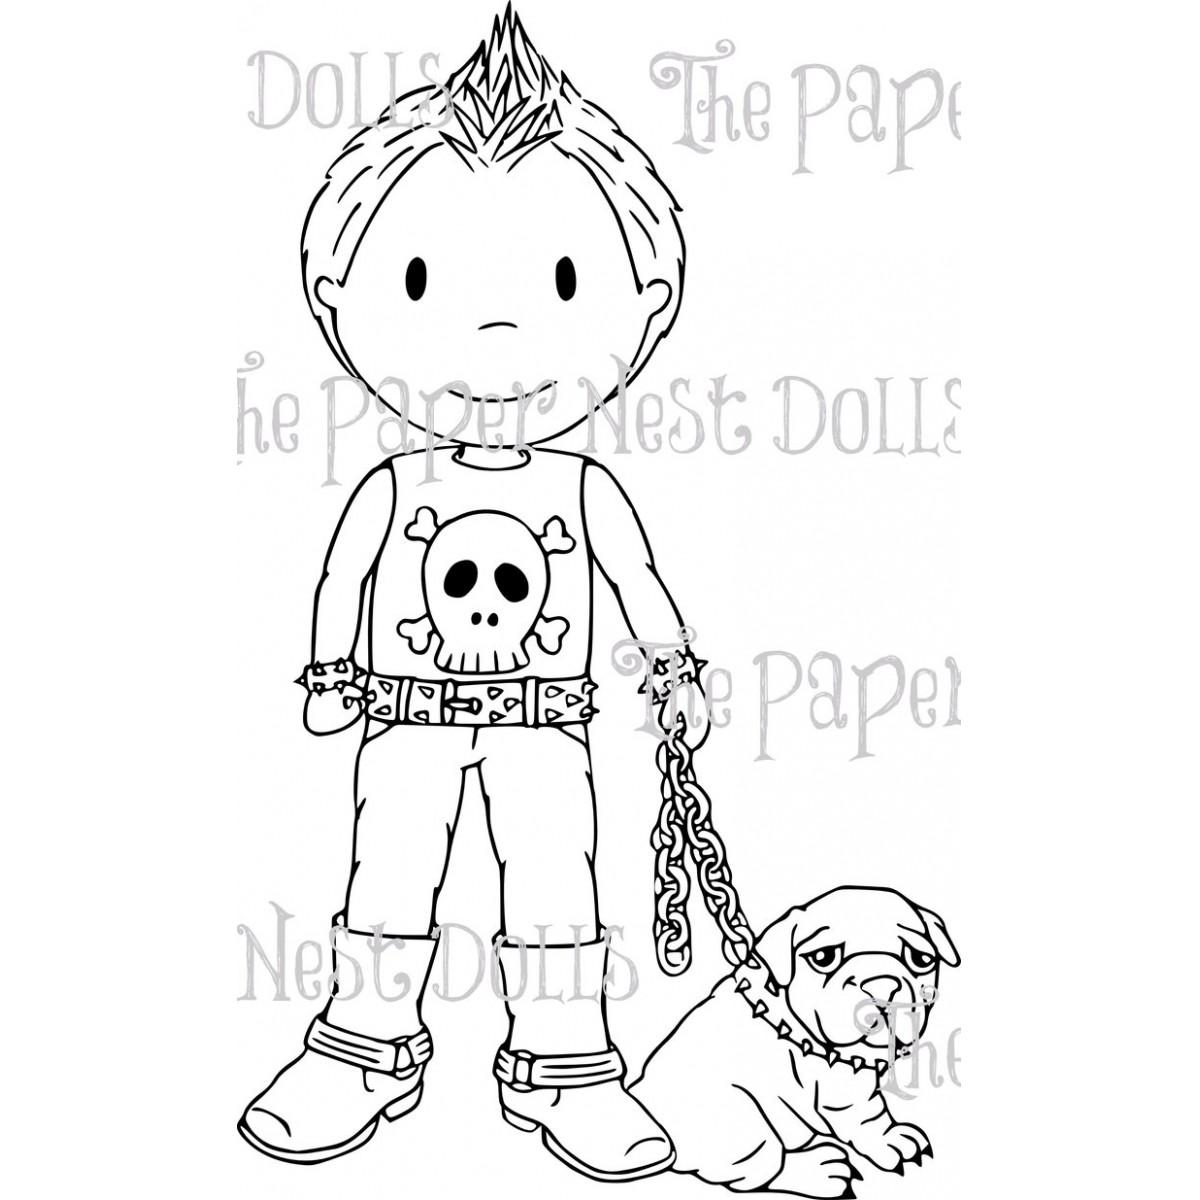 Carimbo Paper Nest Dolls - Modelo Punk Owen  - JuJu Scrapbook